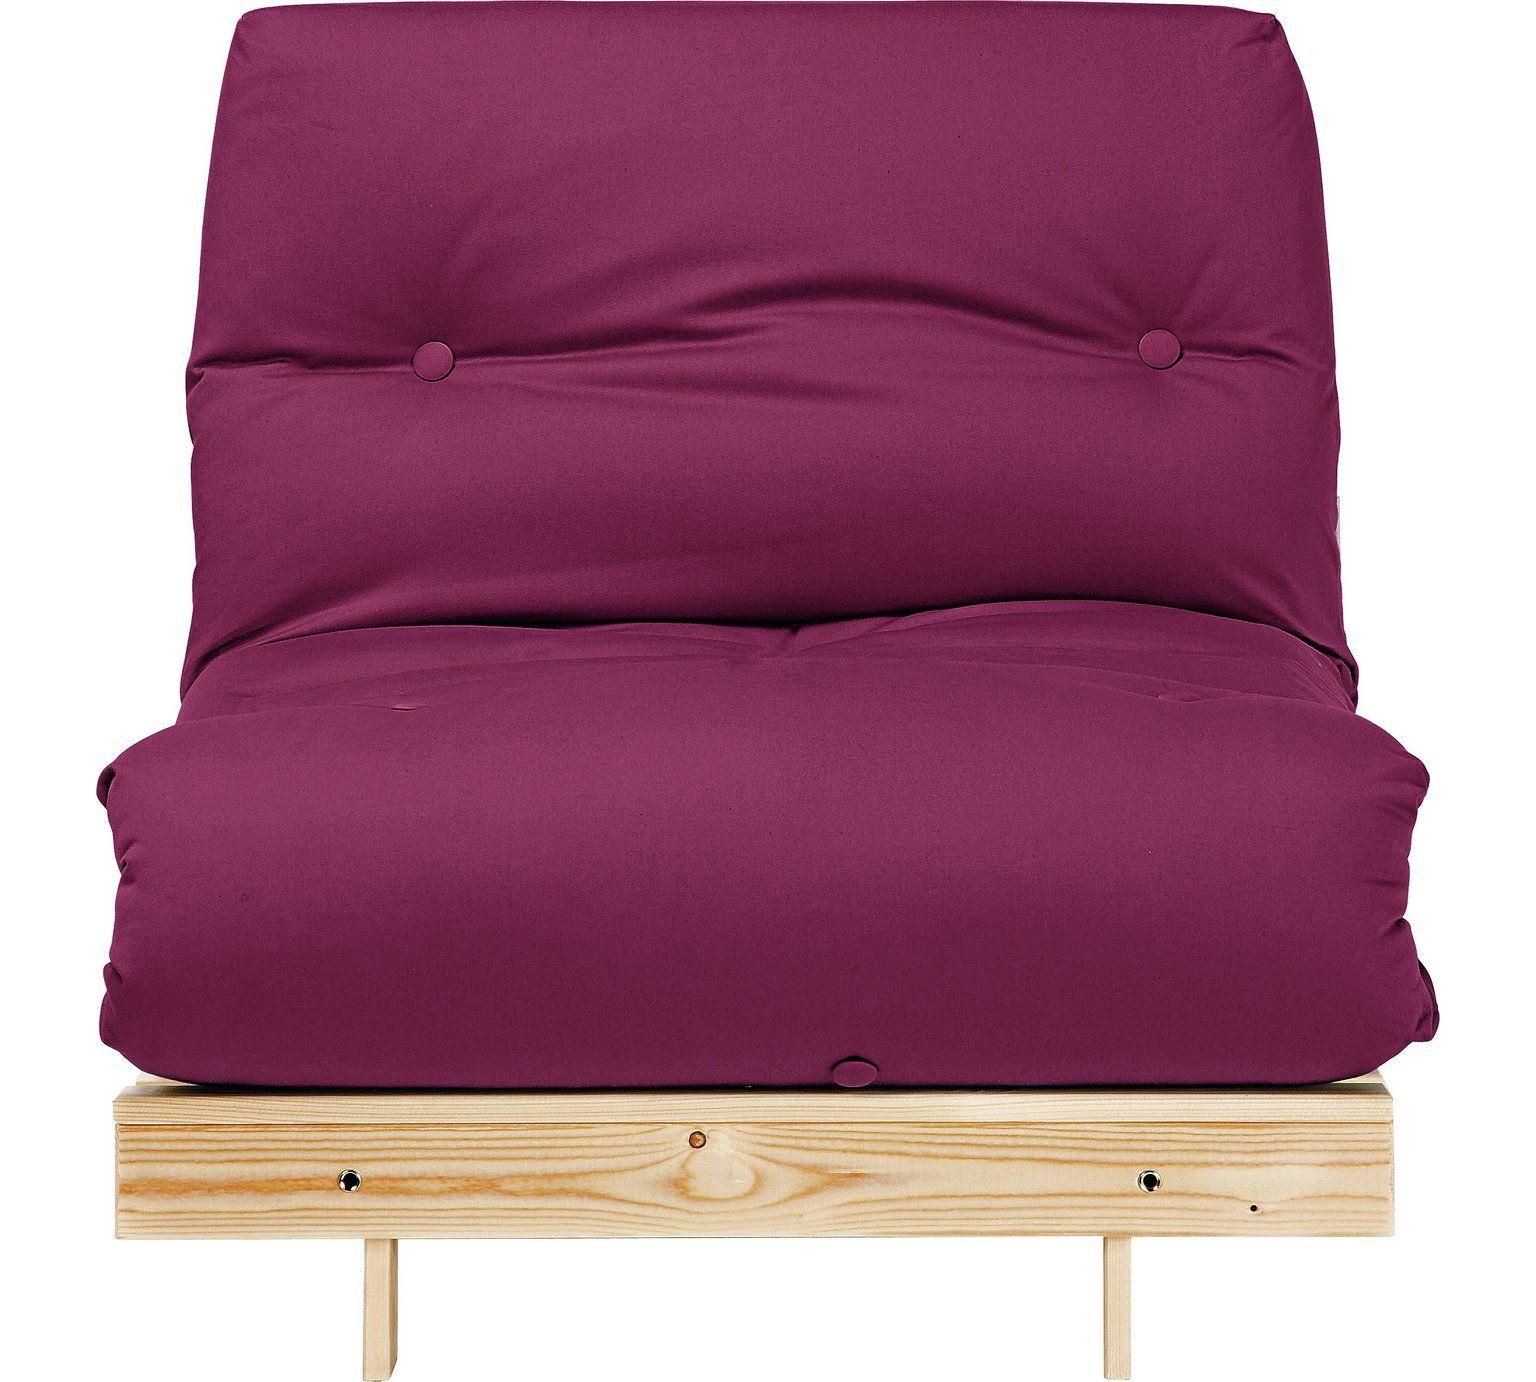 Buy HOME Single Futon Sofa Bed with Mattress Grape